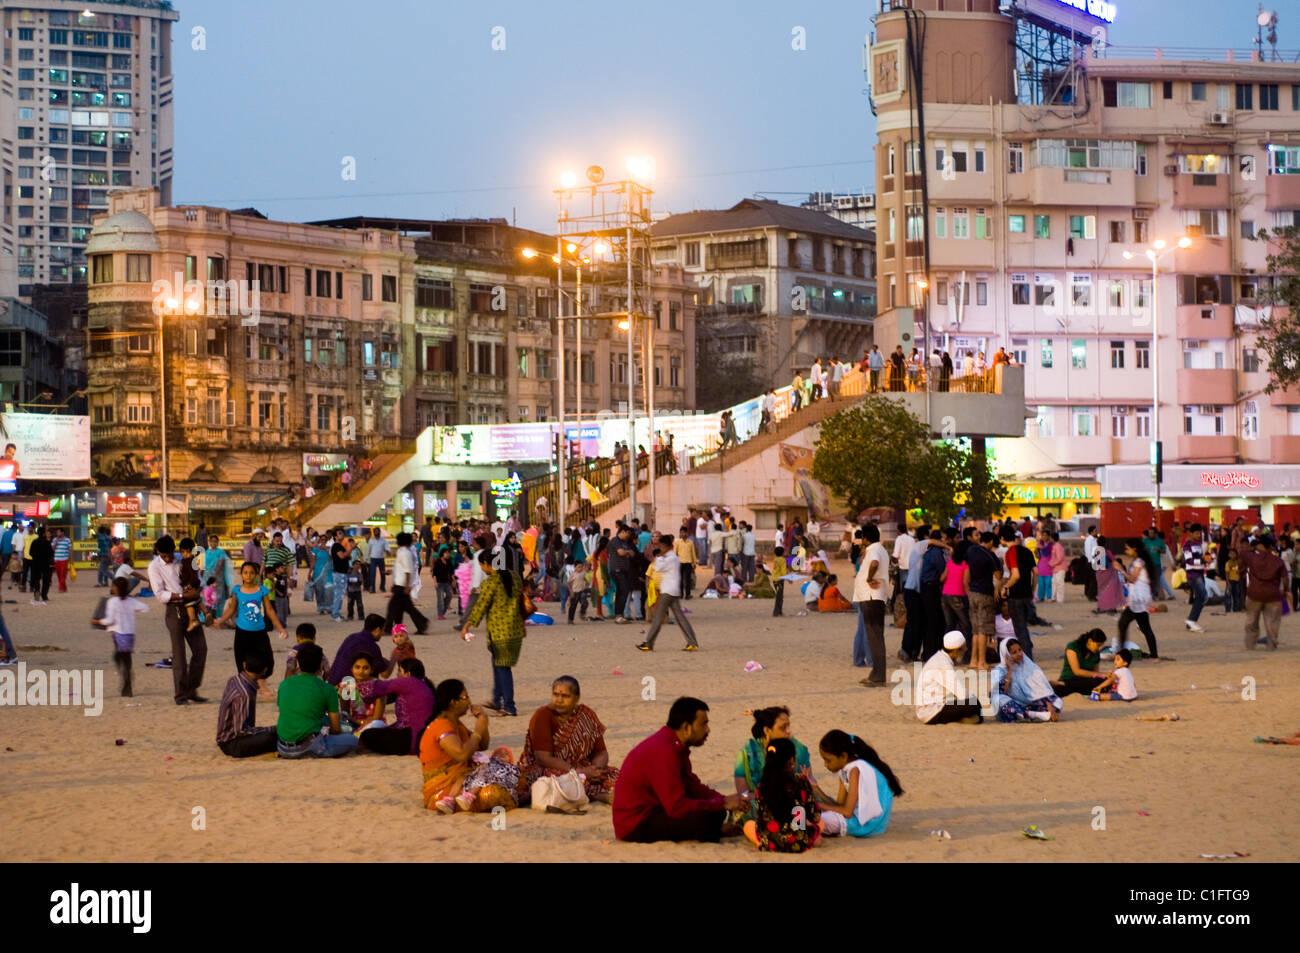 Scène de plage Chowpatty, Mumbai, Inde Photo Stock